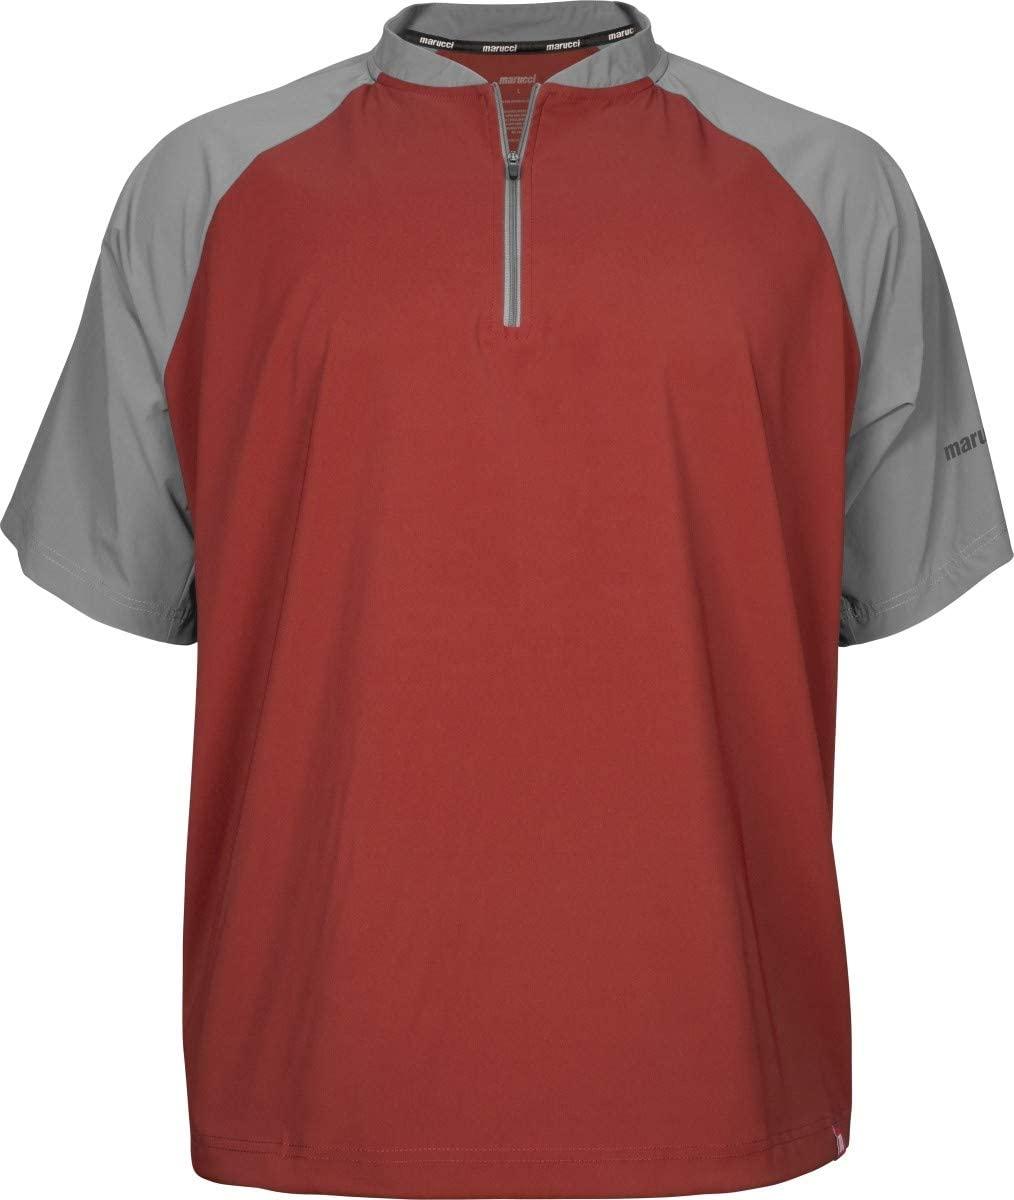 marucci-team-cage-jacket-red-matcgj-r-as-baseball-outerwear MATCGJ-R-S Marucci